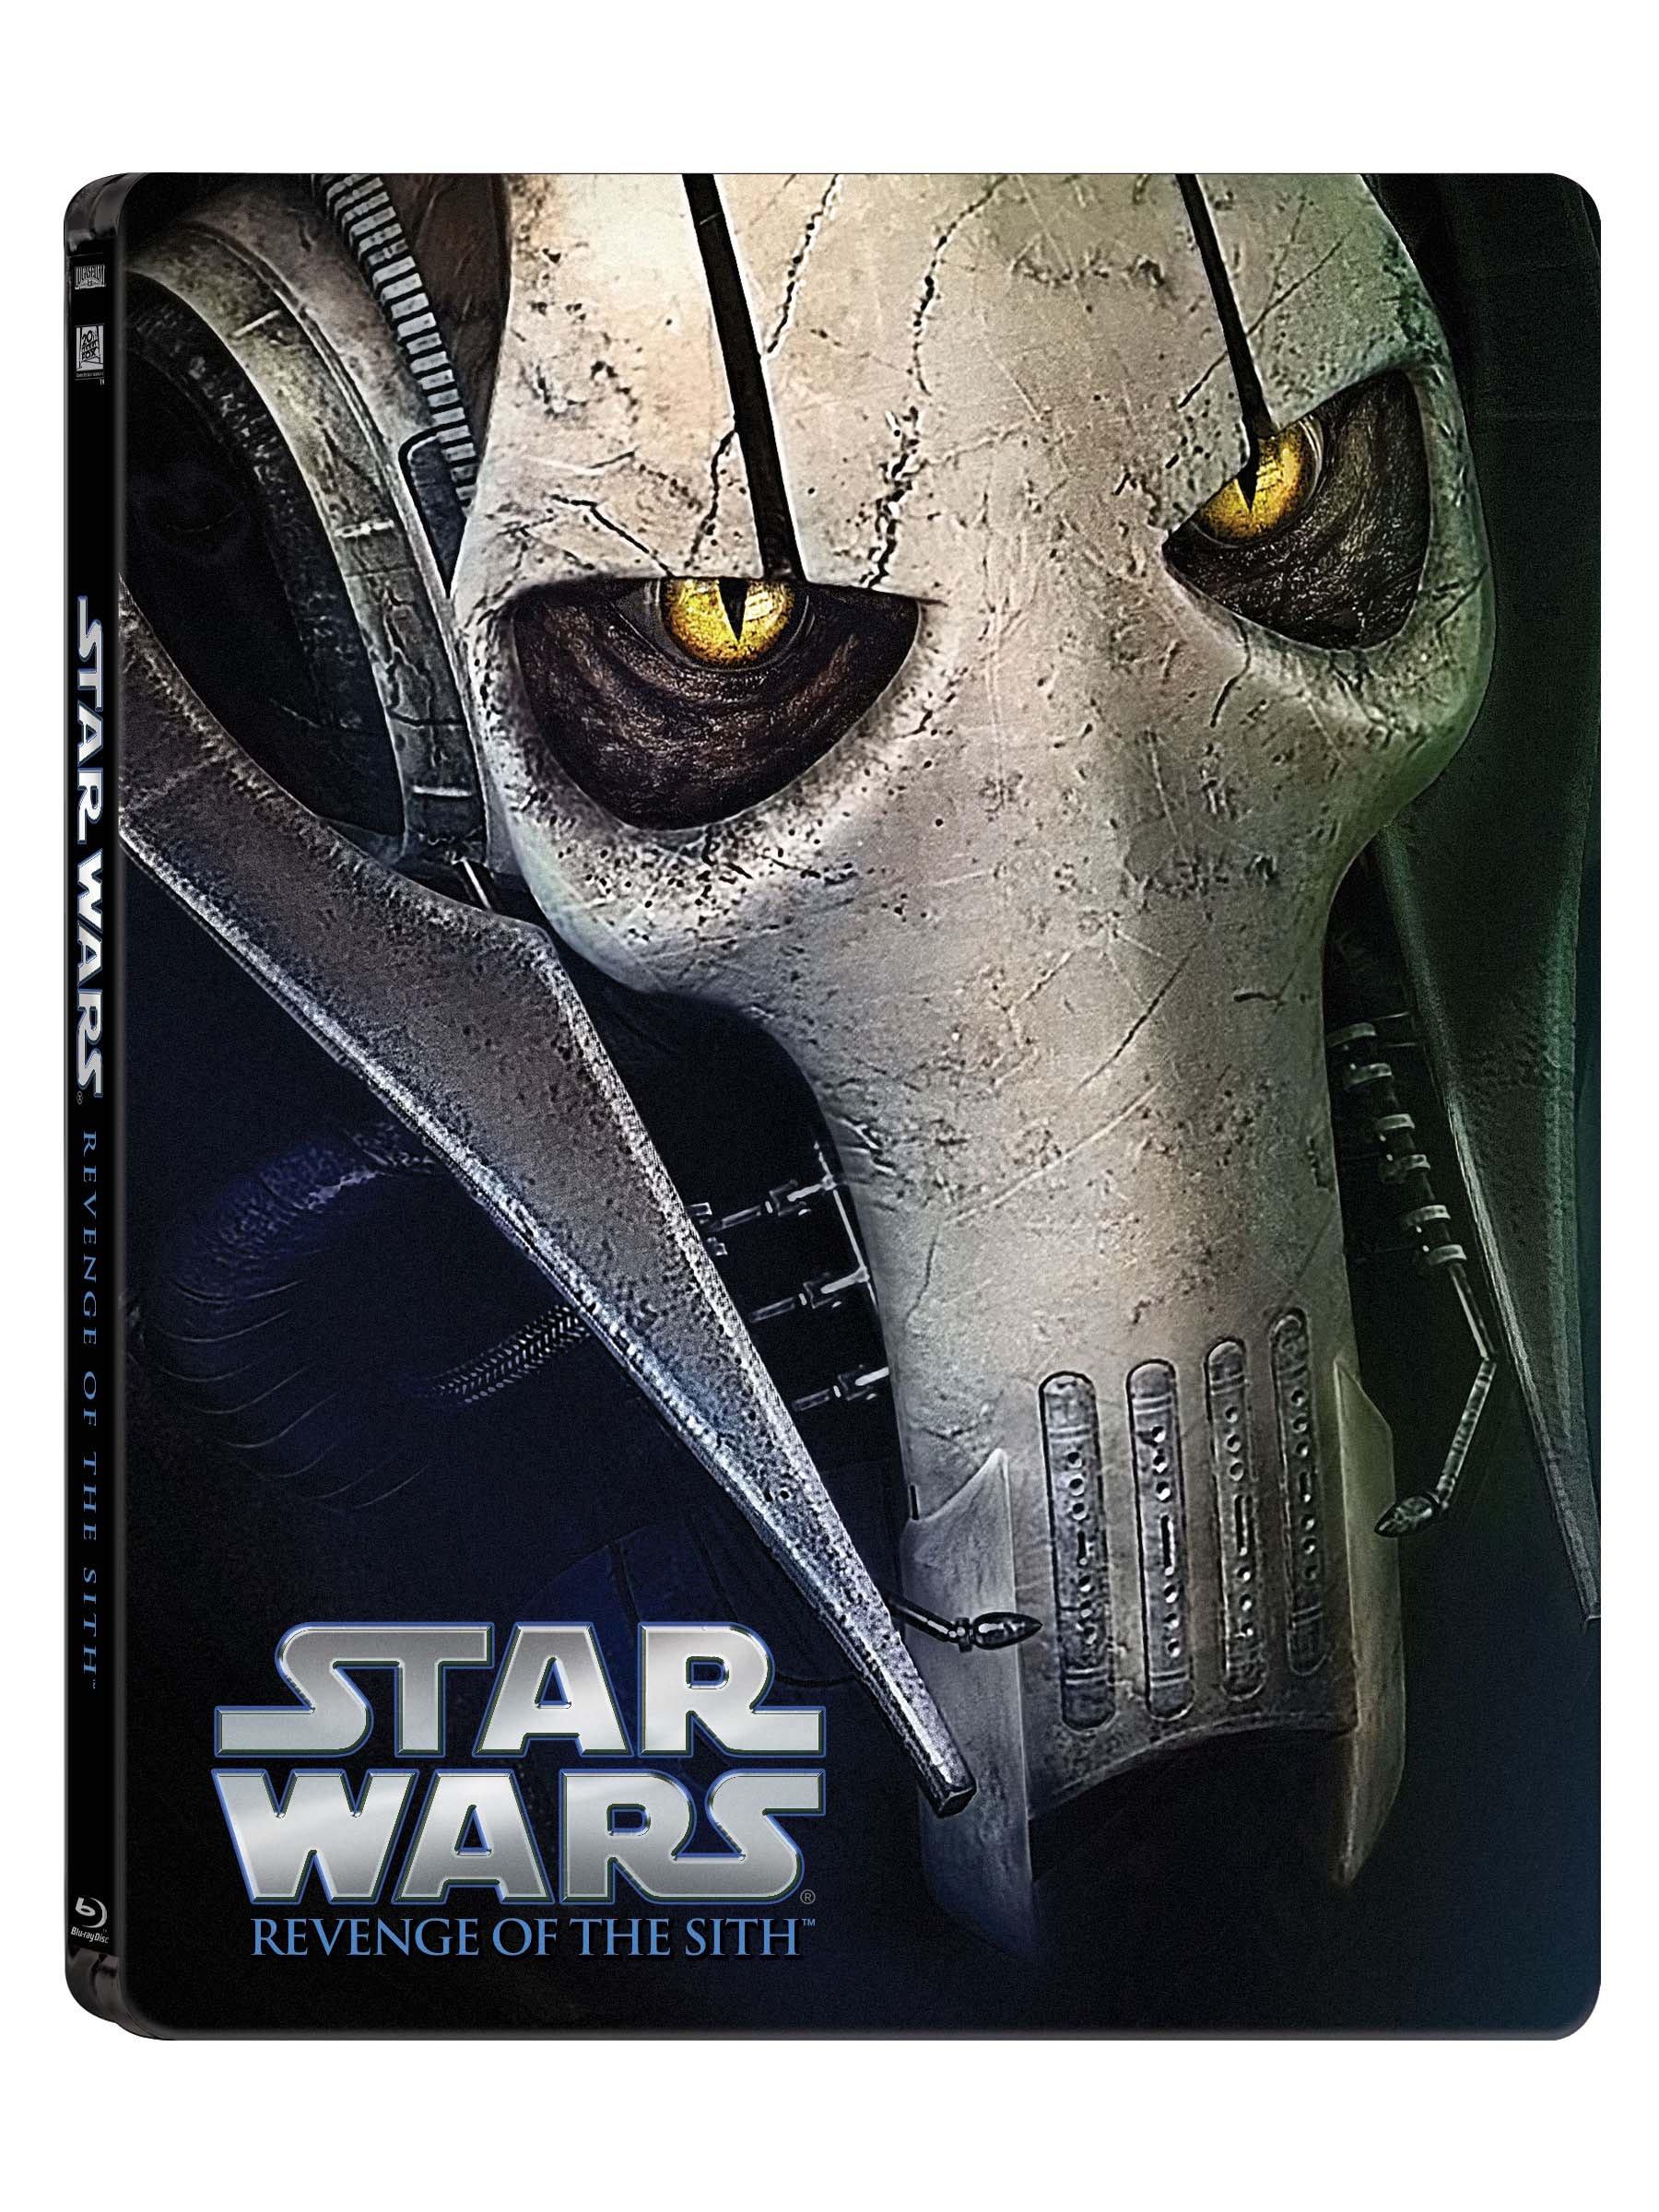 Star Wars Episode Iii Revenge Of The Sith Steelbook Blu Ray Ebay